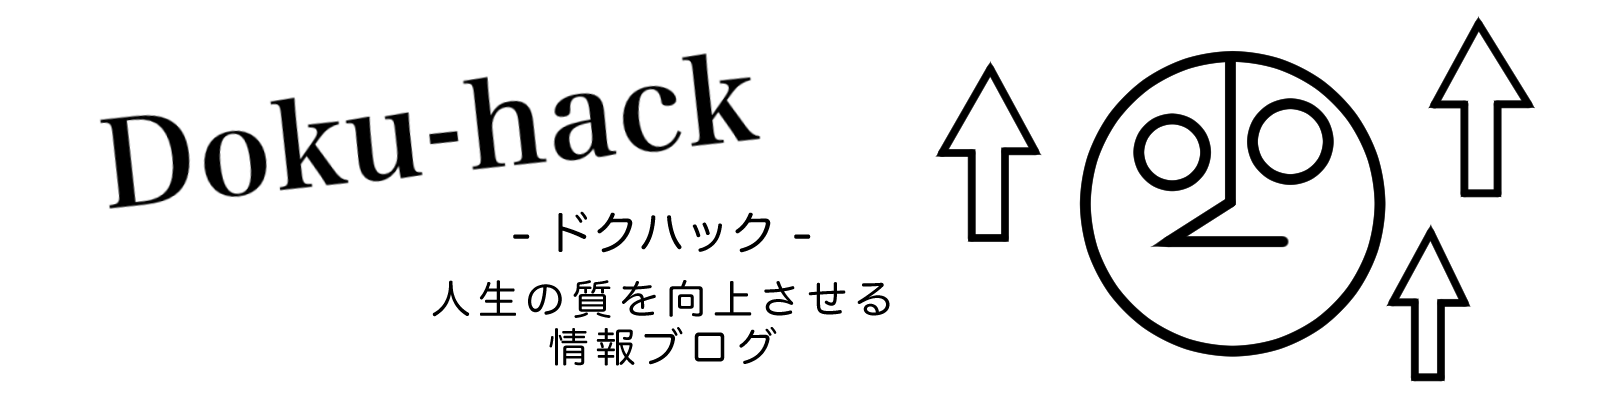 Doku-hack -ドクハック-